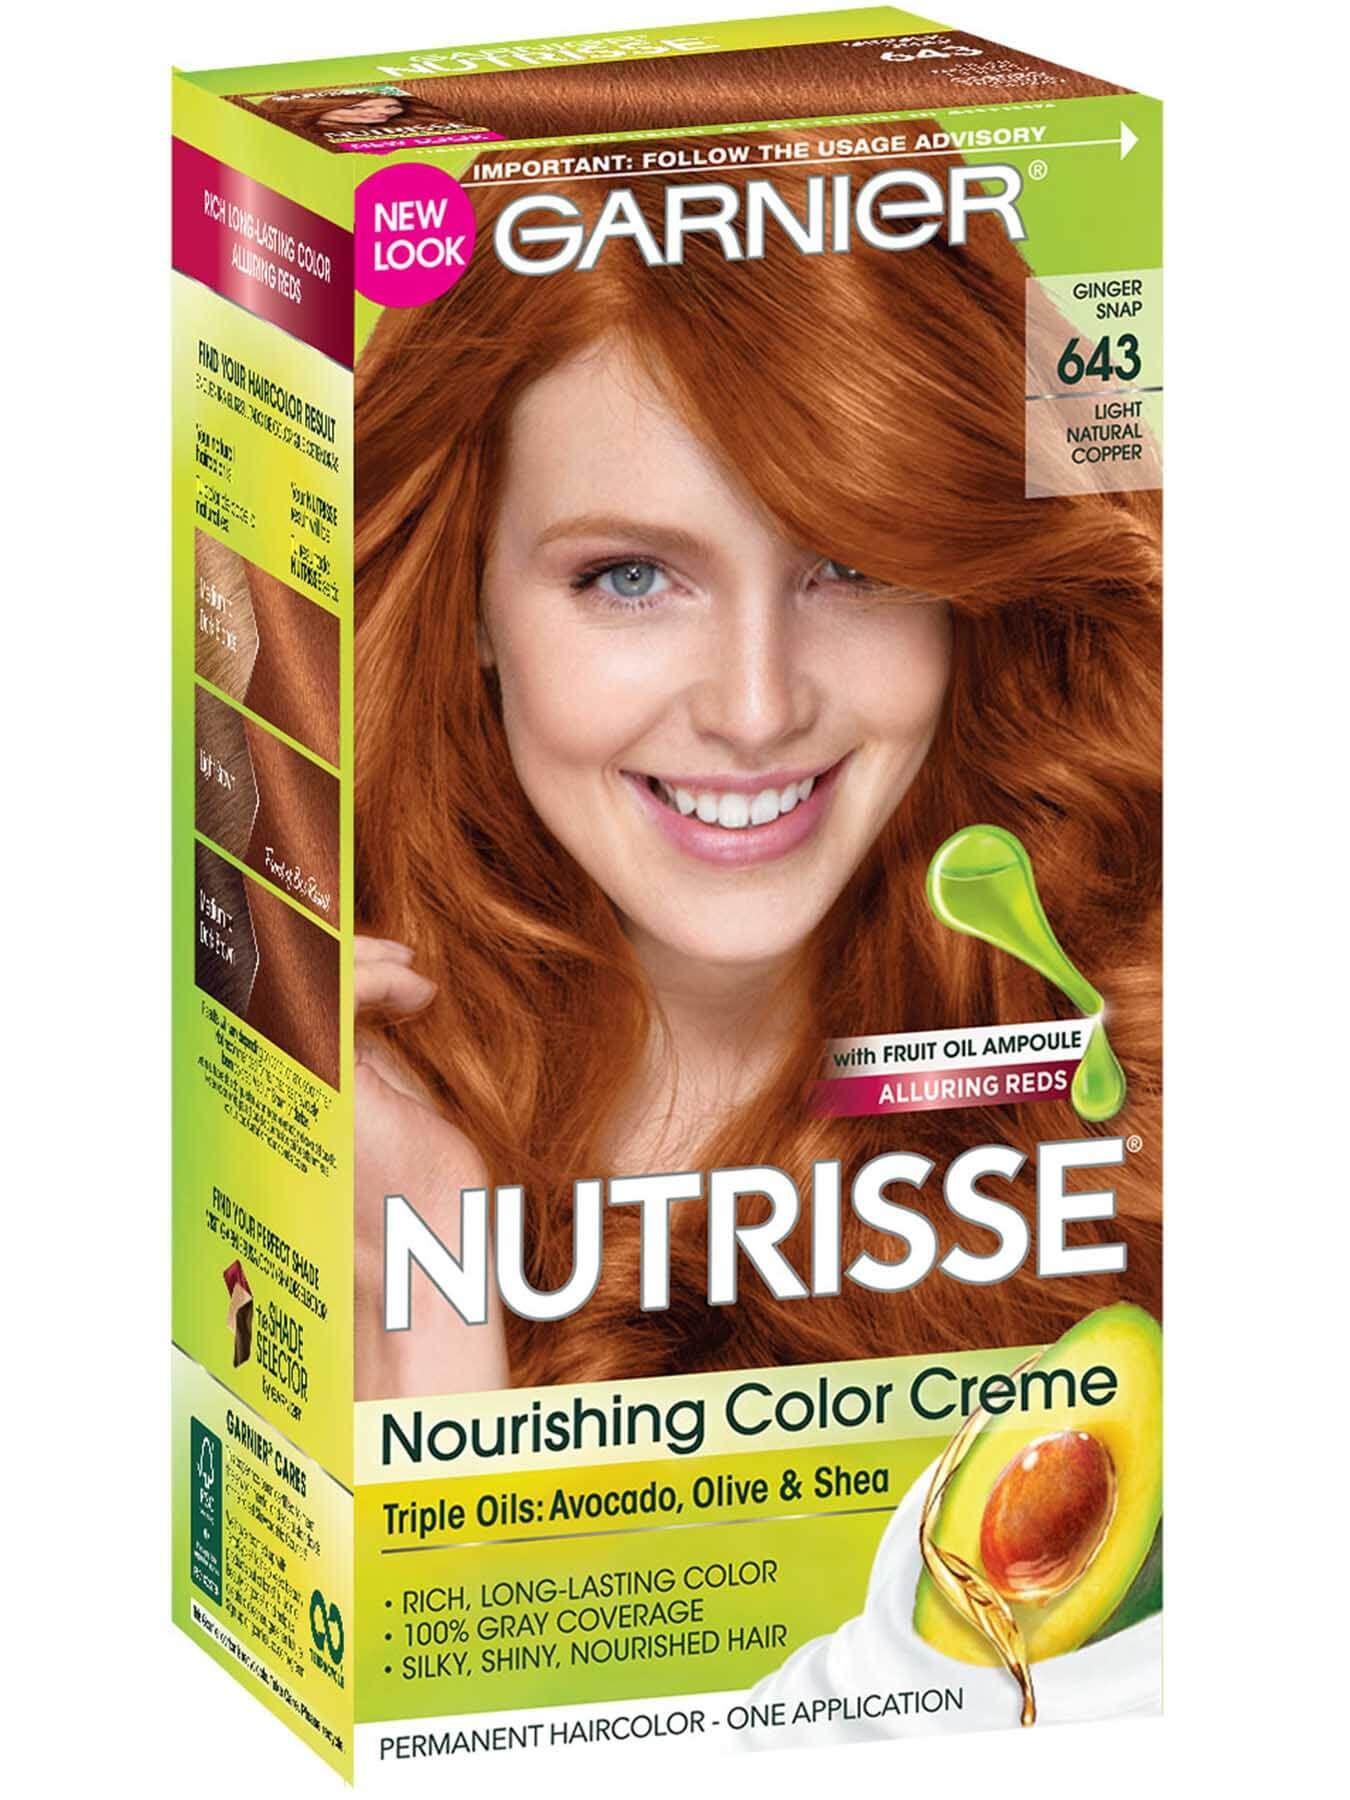 643 Light Natural Copper Color De Pelo Cobrizo Tintes De